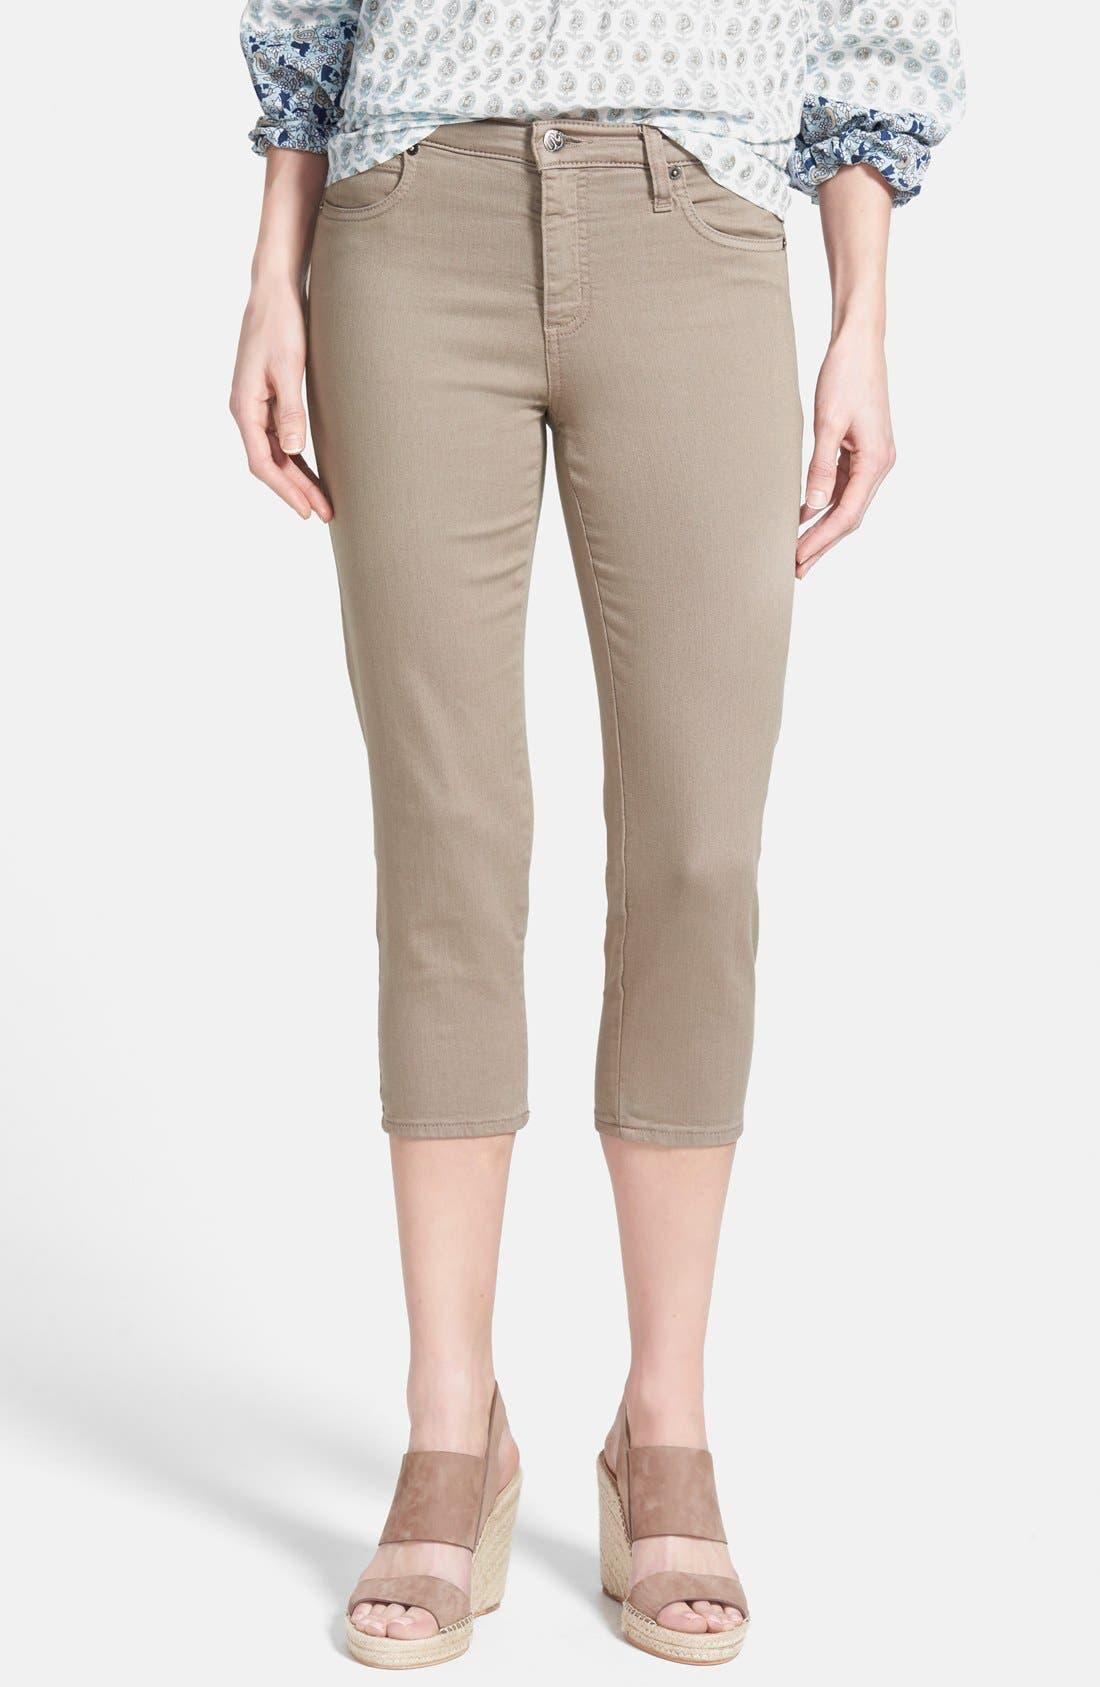 Main Image - Second Yoga Jeans Capri Jeans